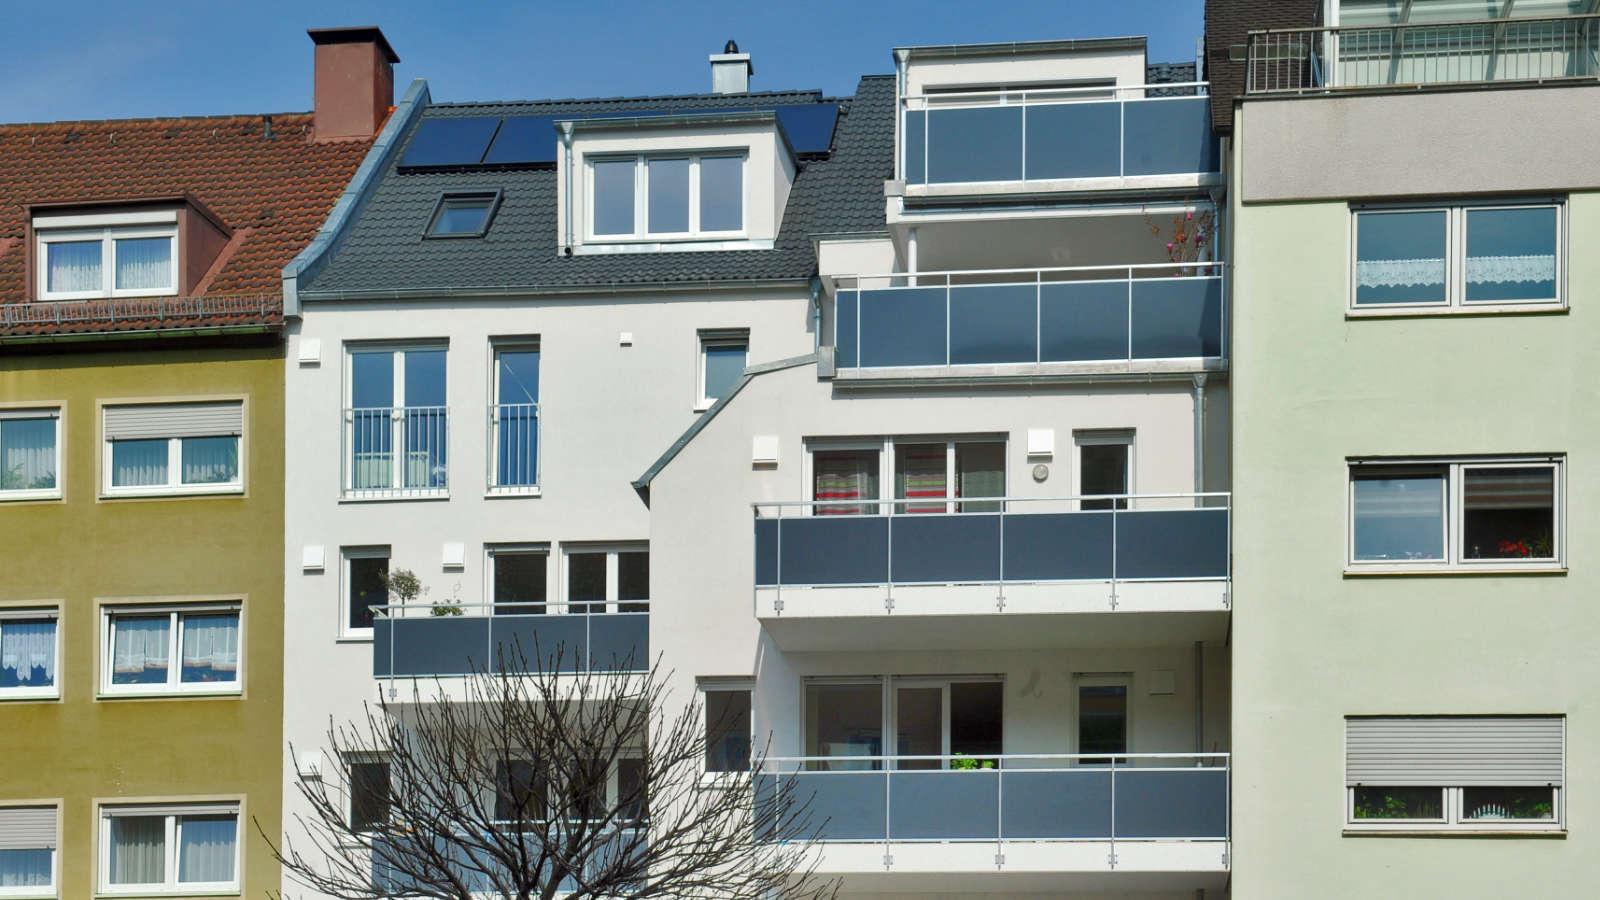 Brosamerstraße | Referenz | Südseite